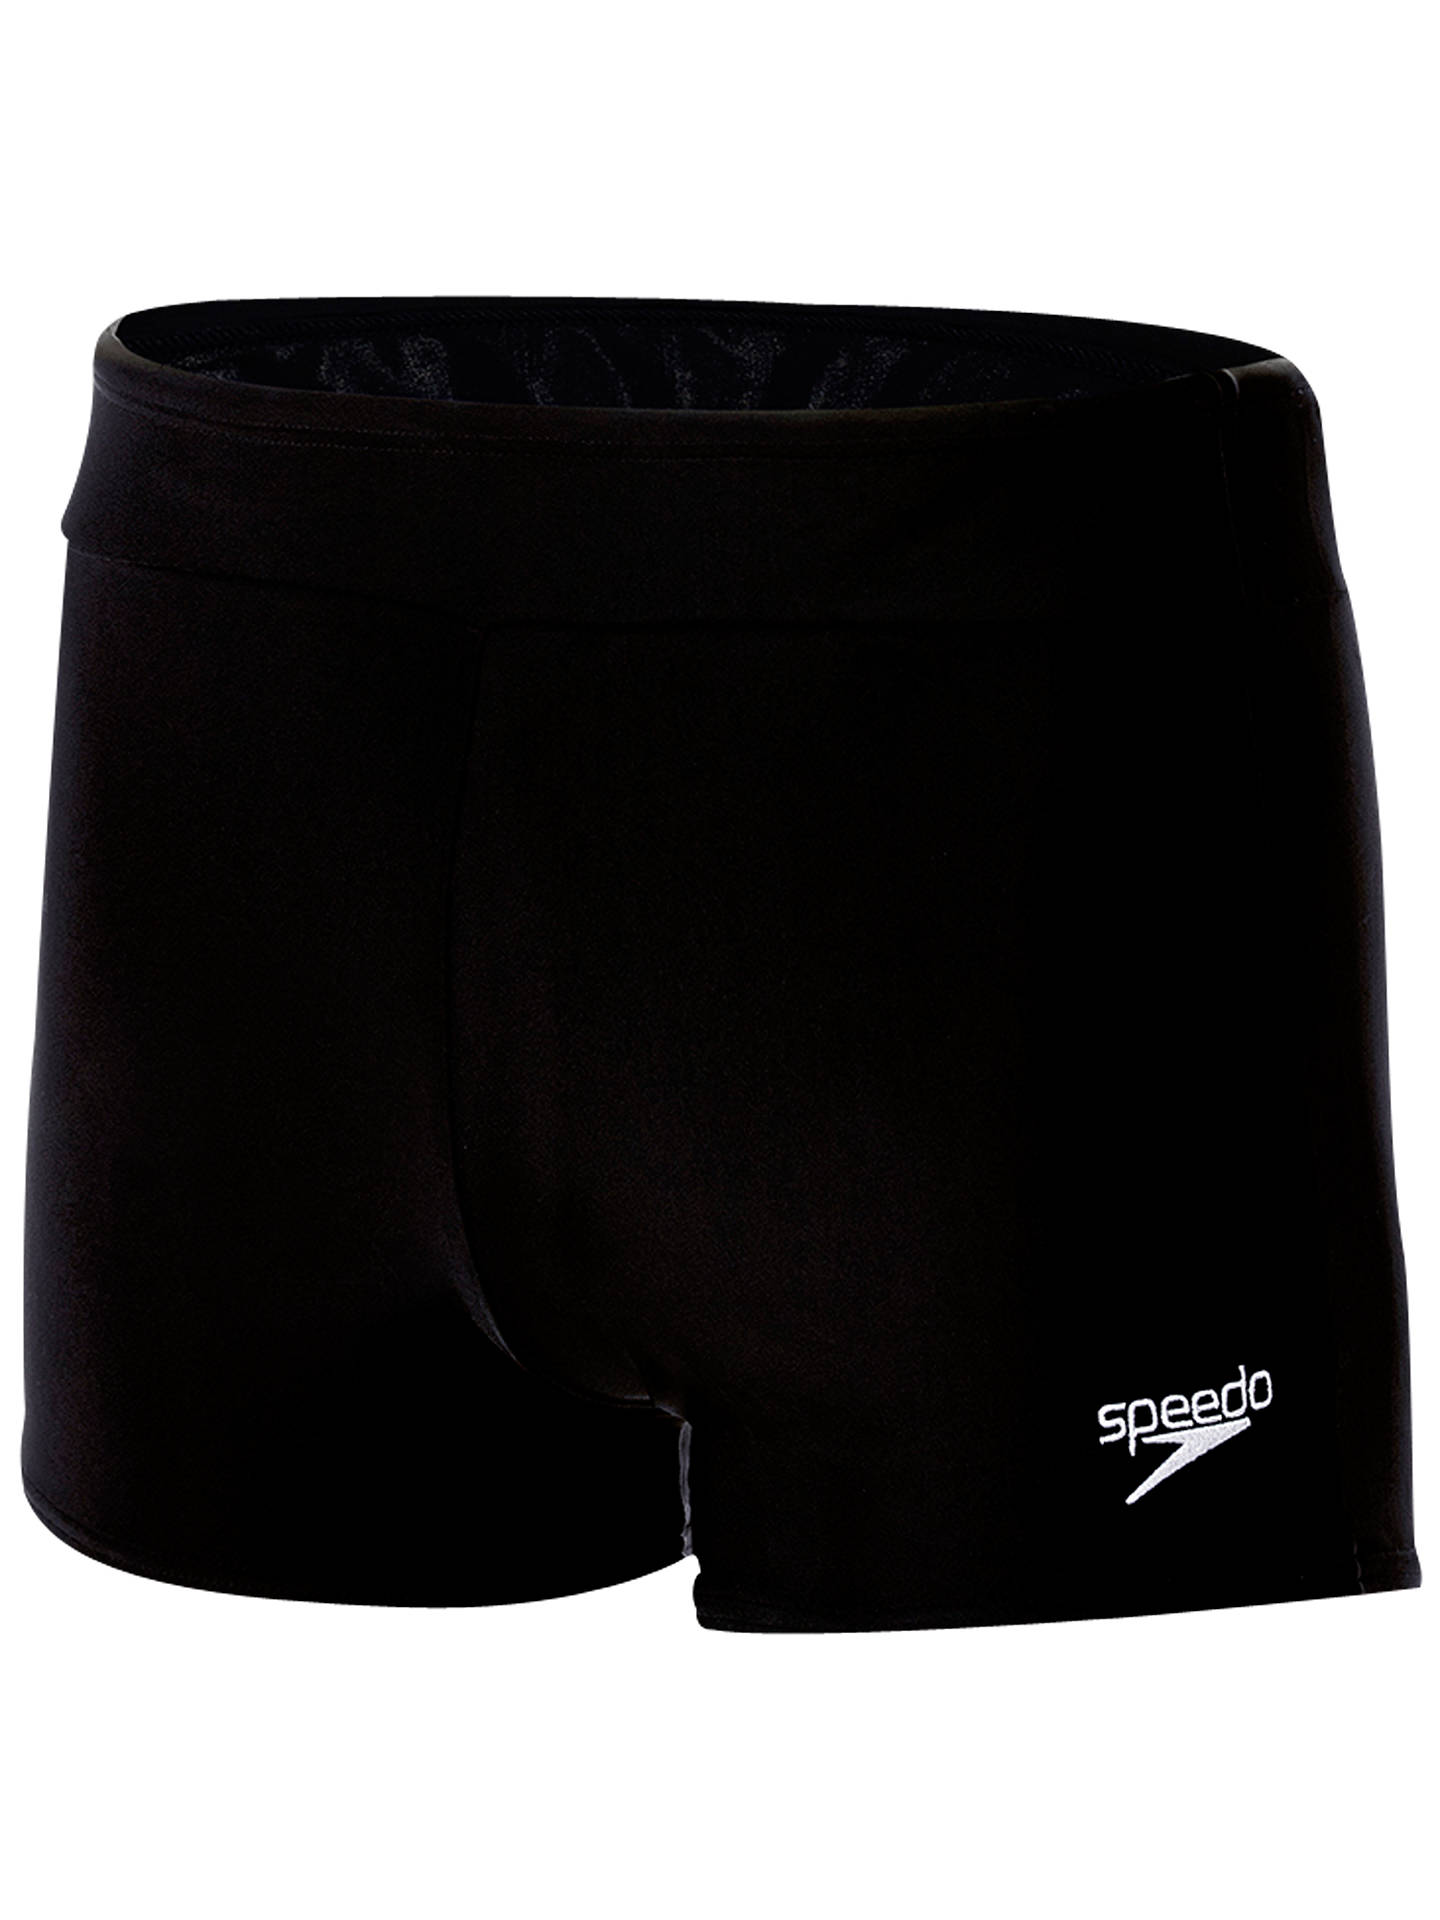 Beautiful Star Trail Starry Sky Mens Sports Performance Shorts Underwear 2 Pack